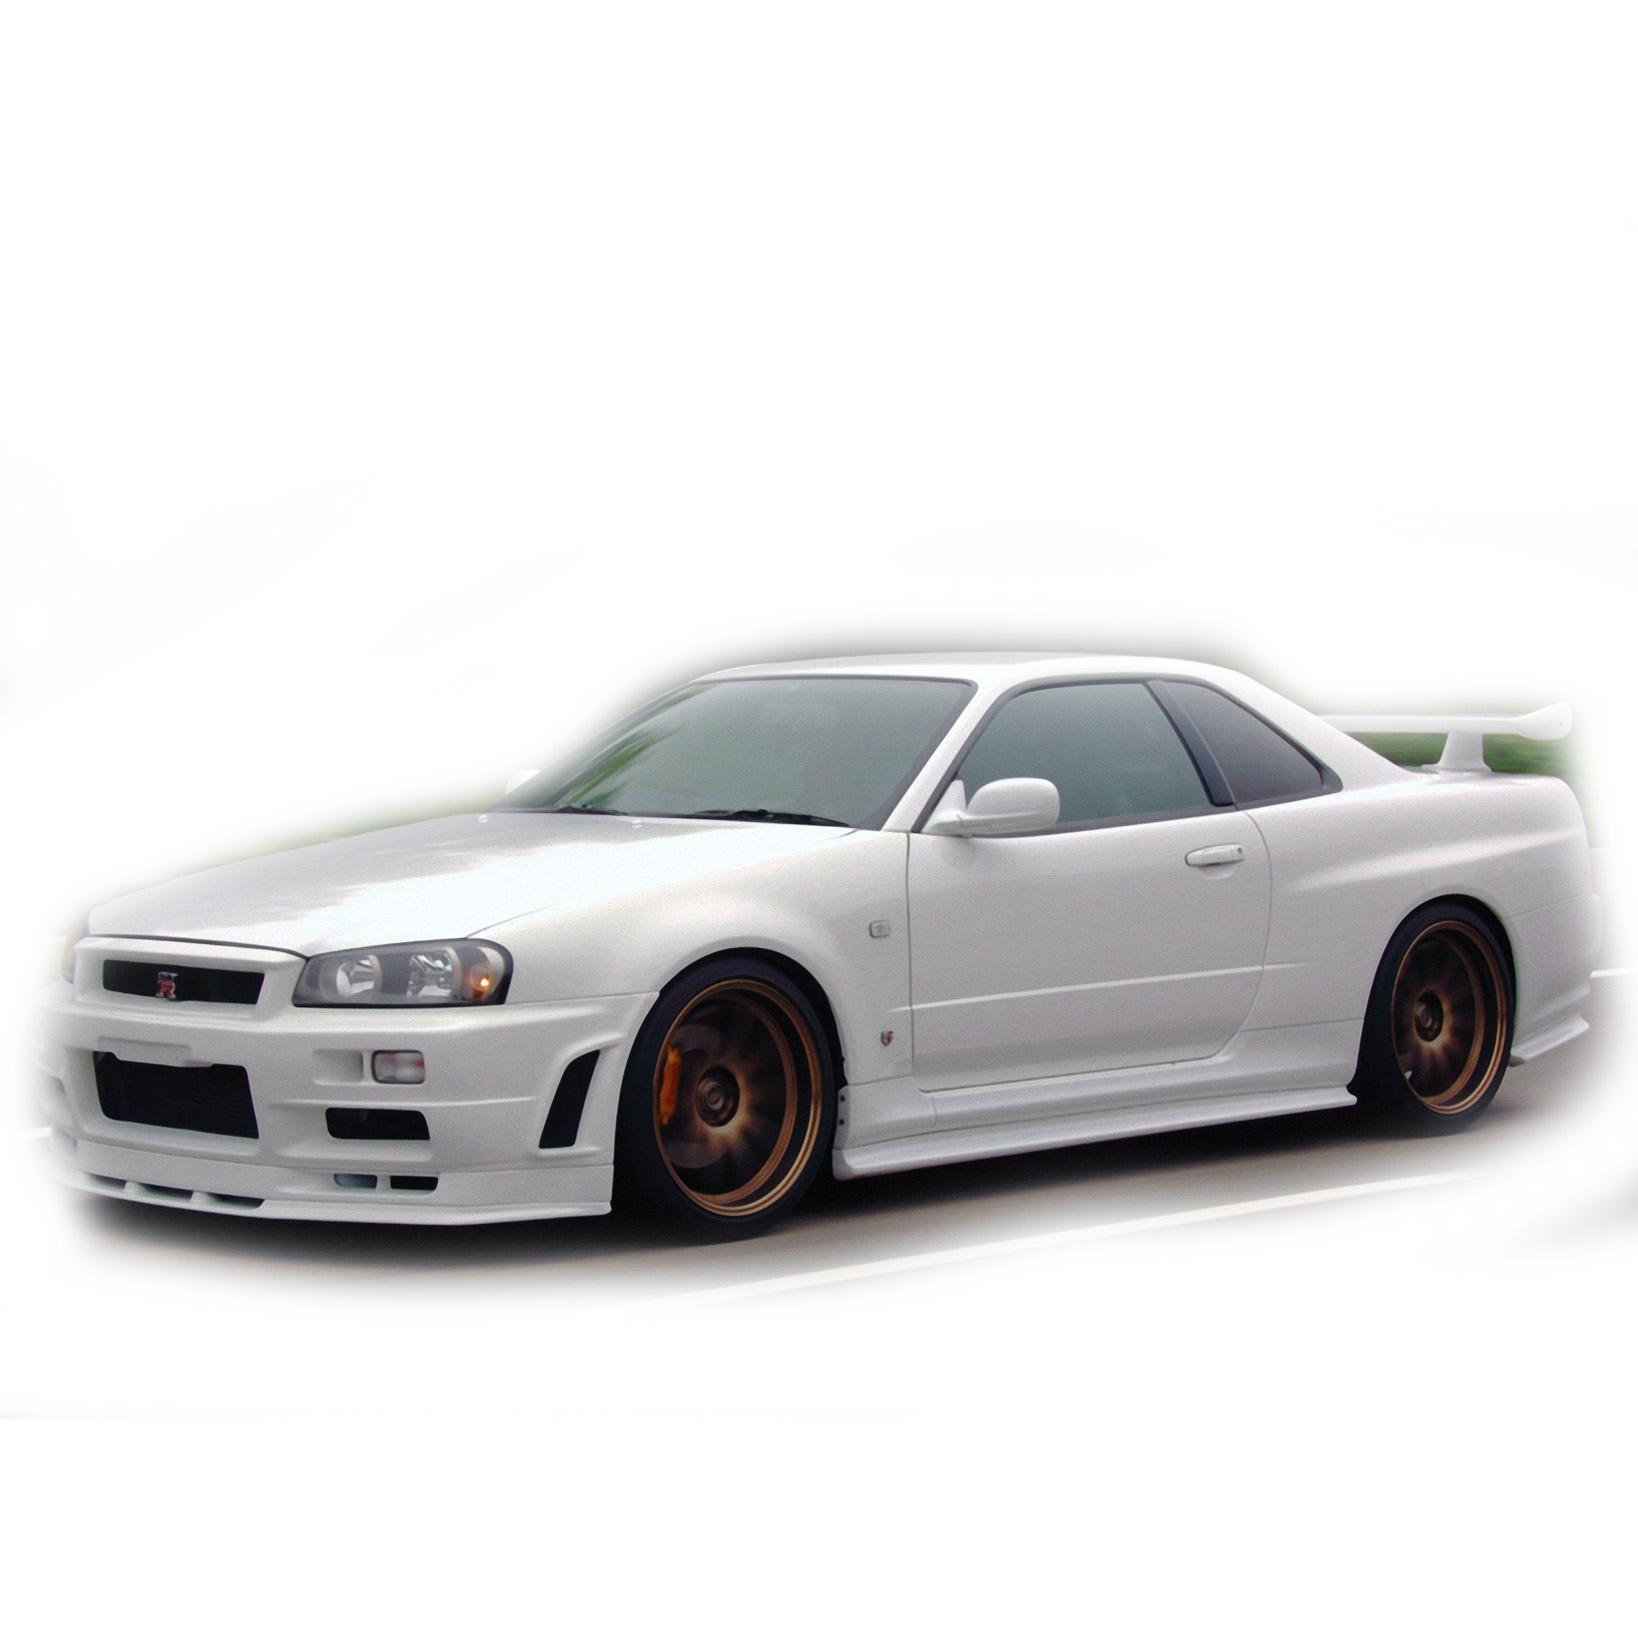 Nissan Skyline R34 1998-2001